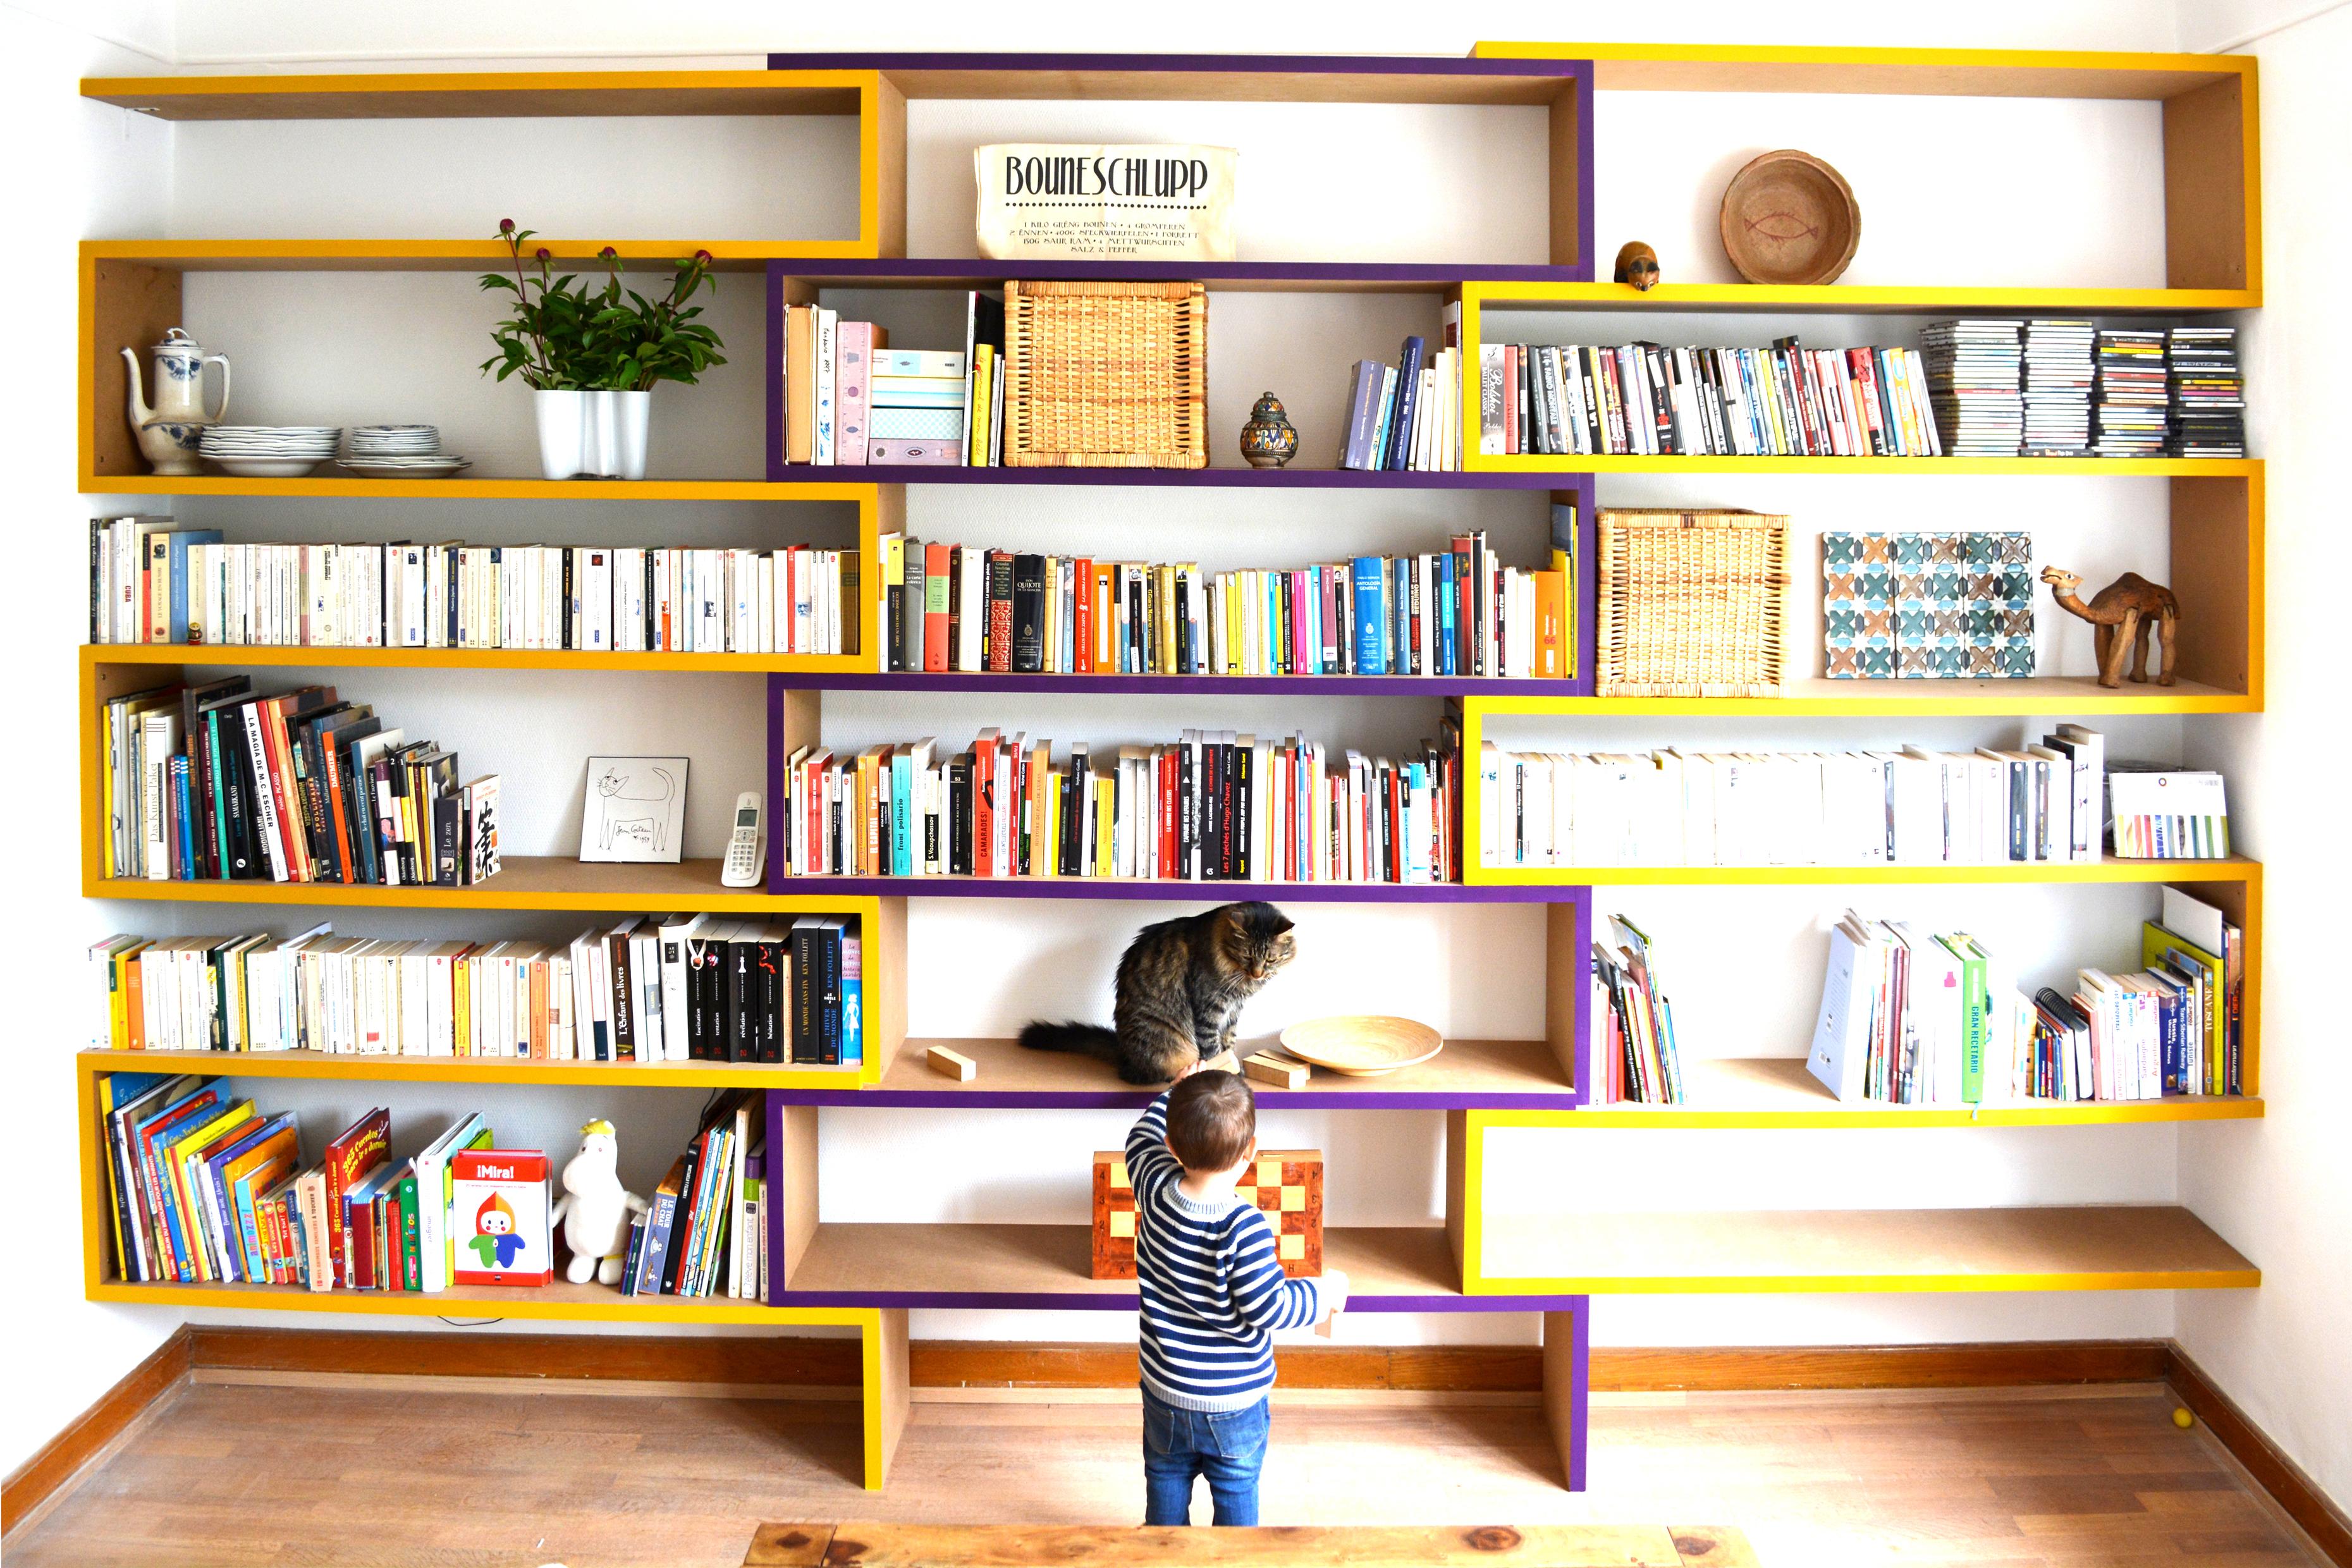 Luxembourg bookcase guerrero architecte s rl luxembourg for Architecte interieur geneve